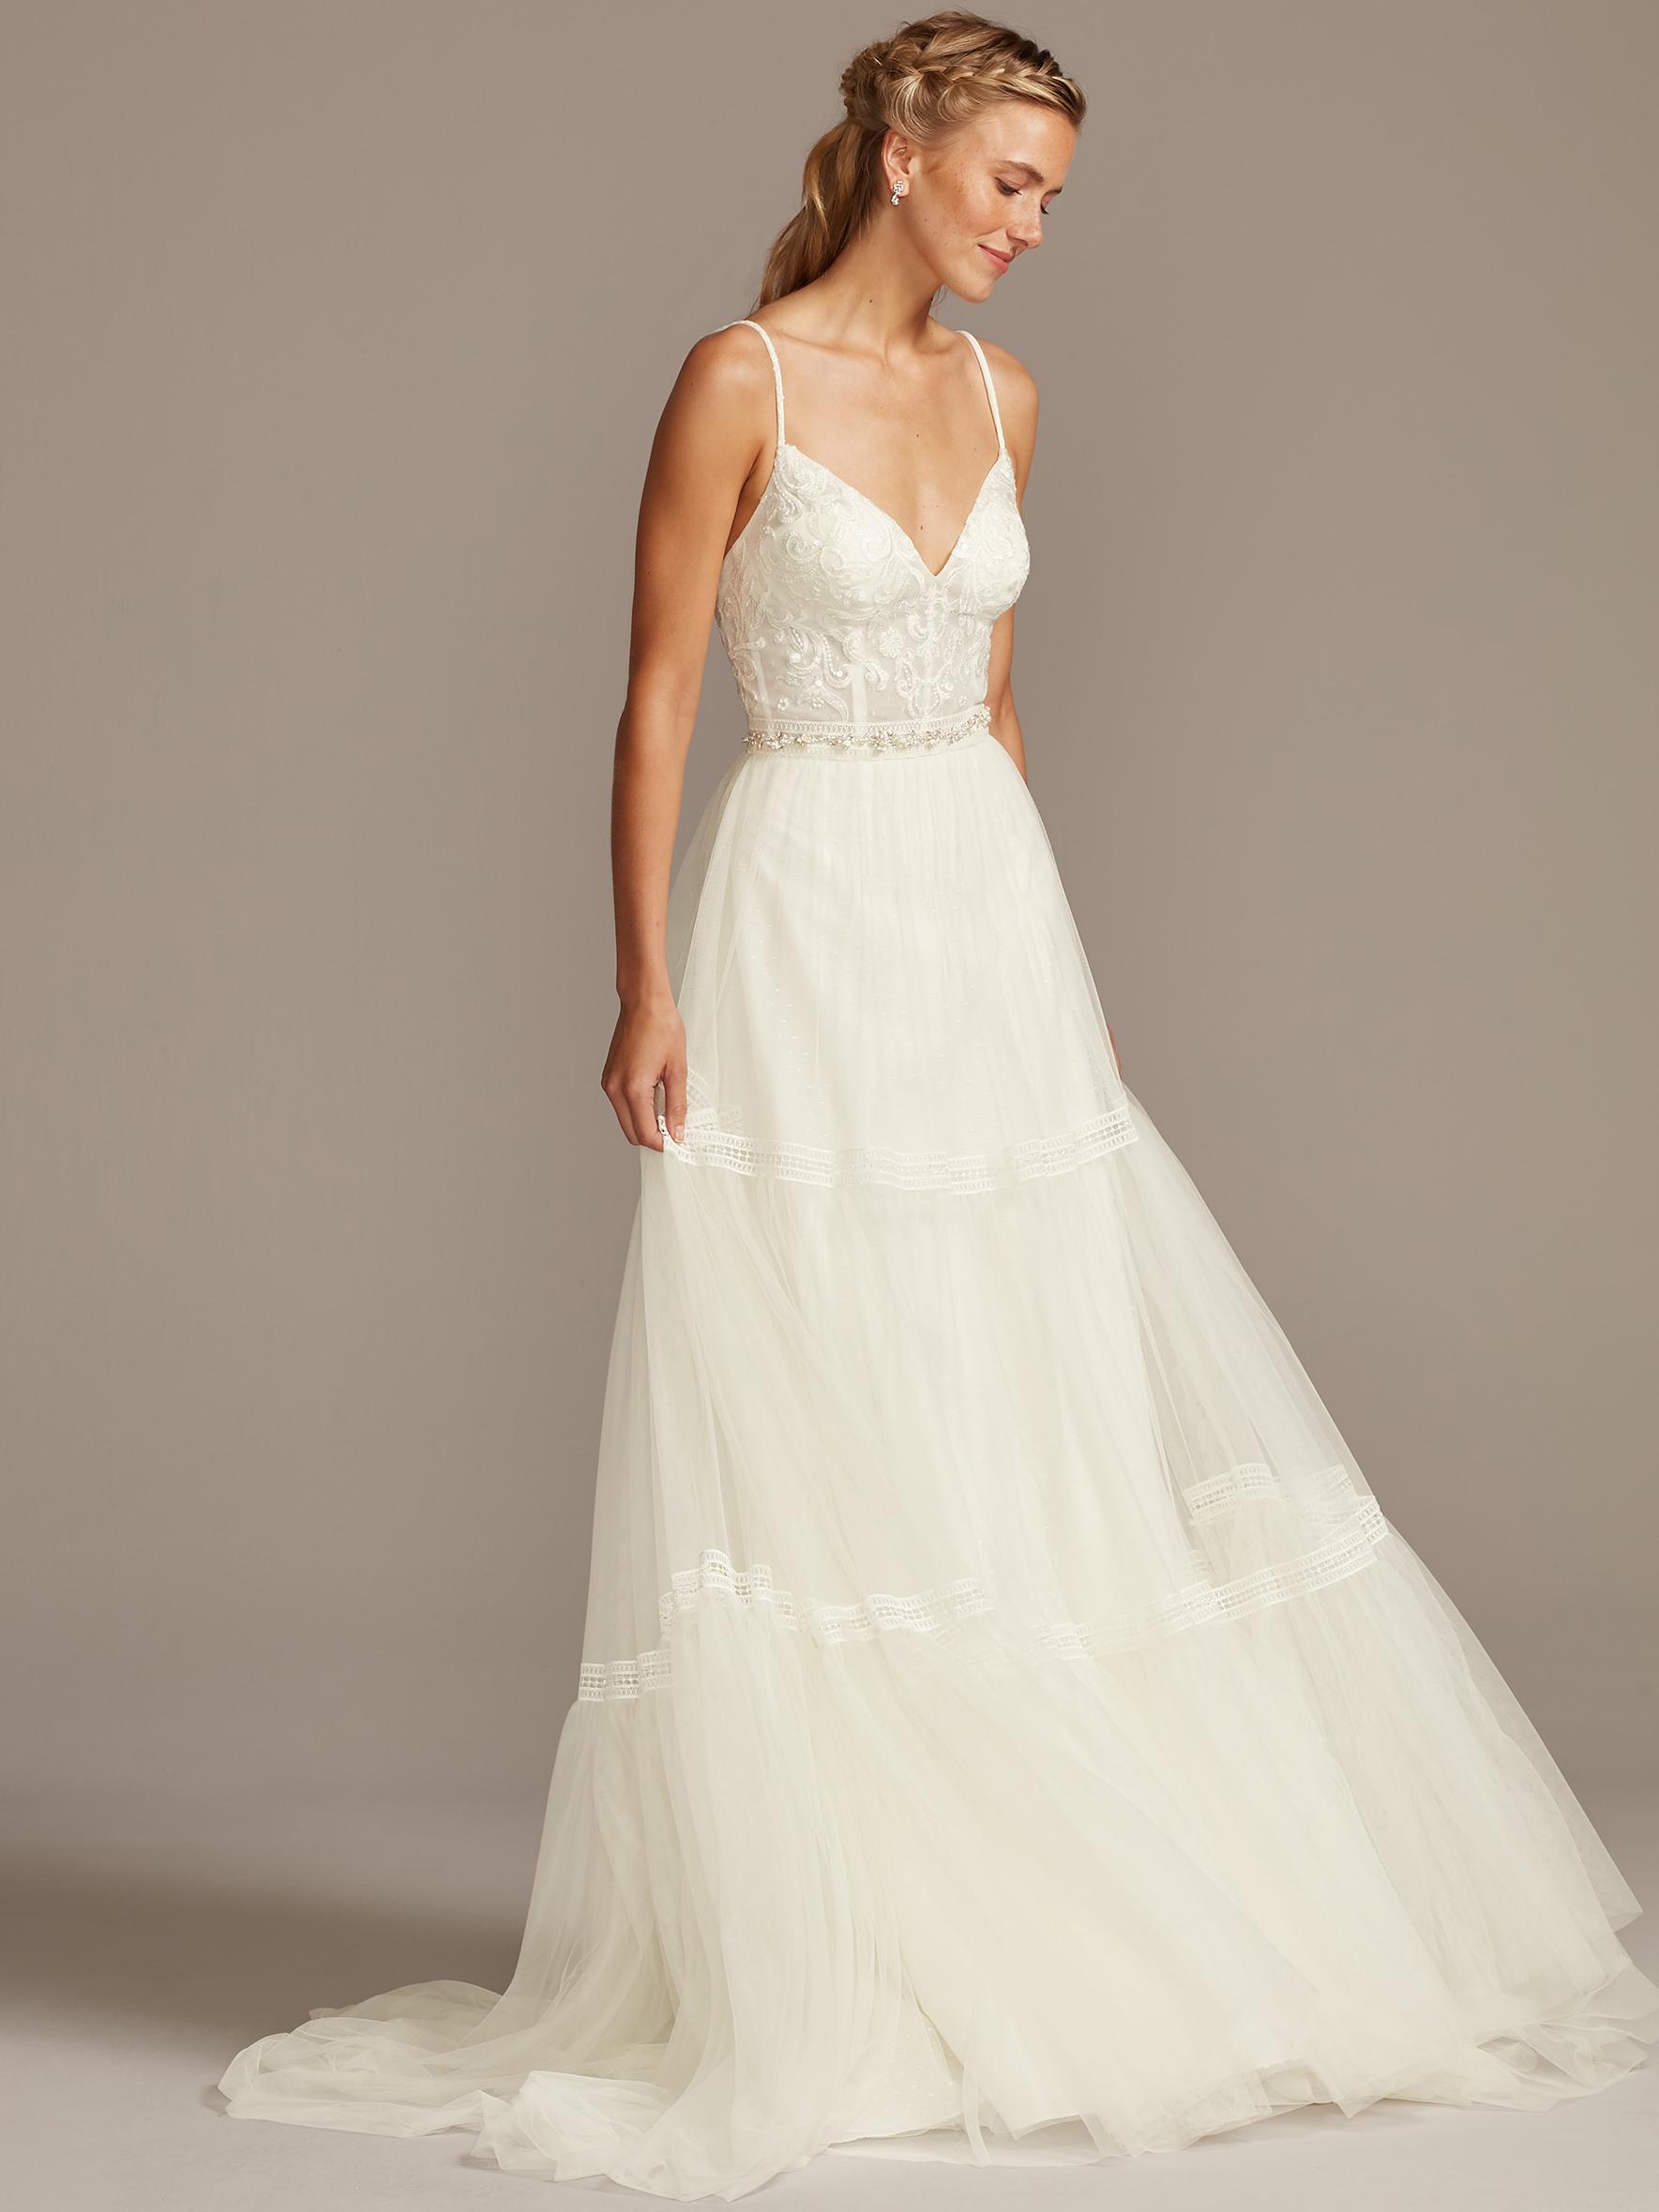 davids bridal melissa sweet boning v-neck spaghetti strap wedding dress fall 2020